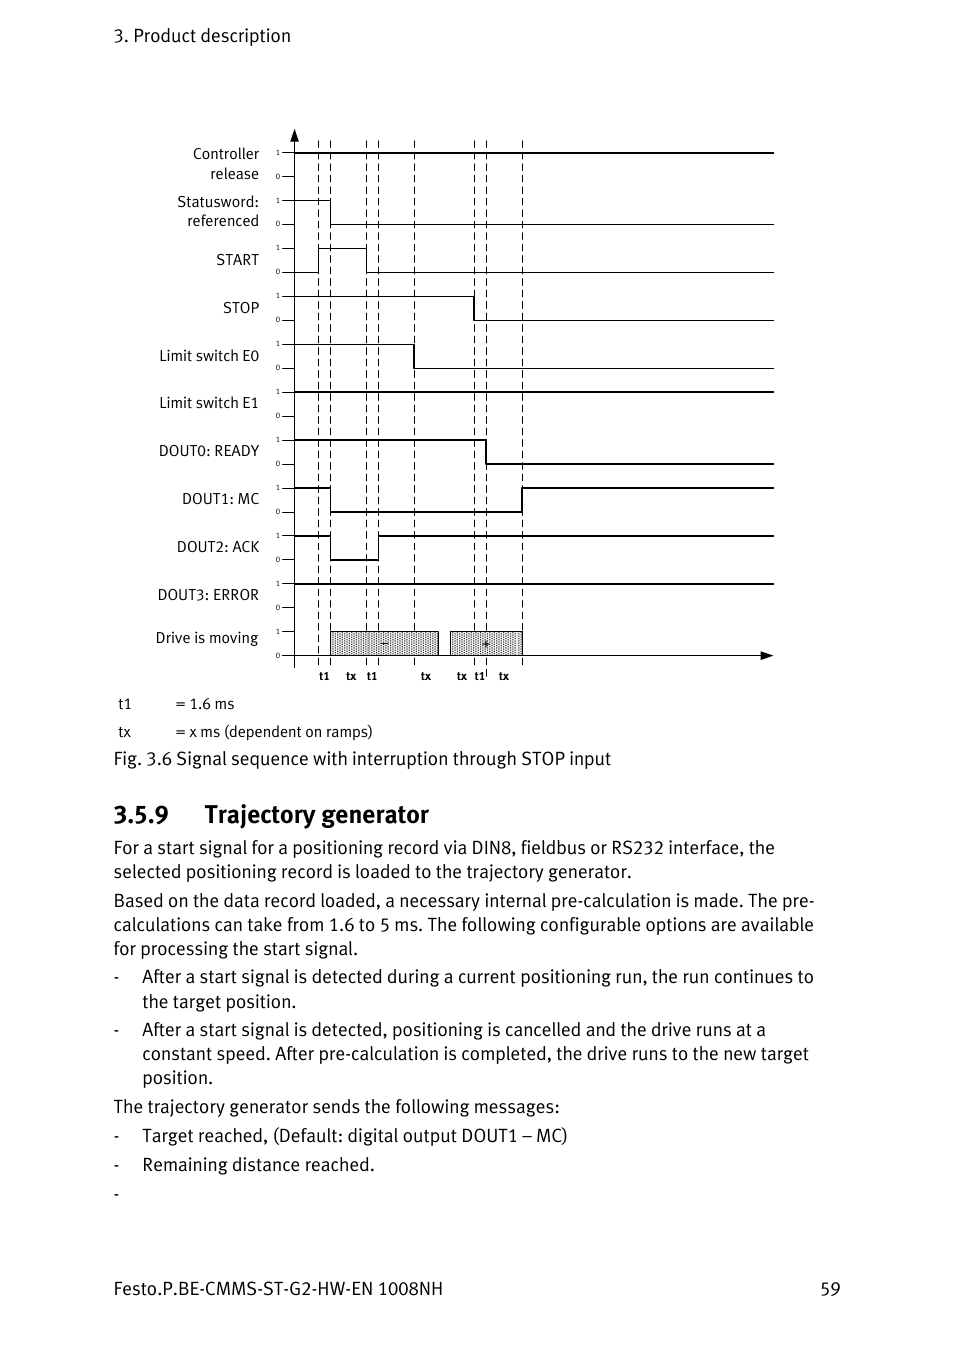 9 trajectory generator, Trajectory generator | Festo